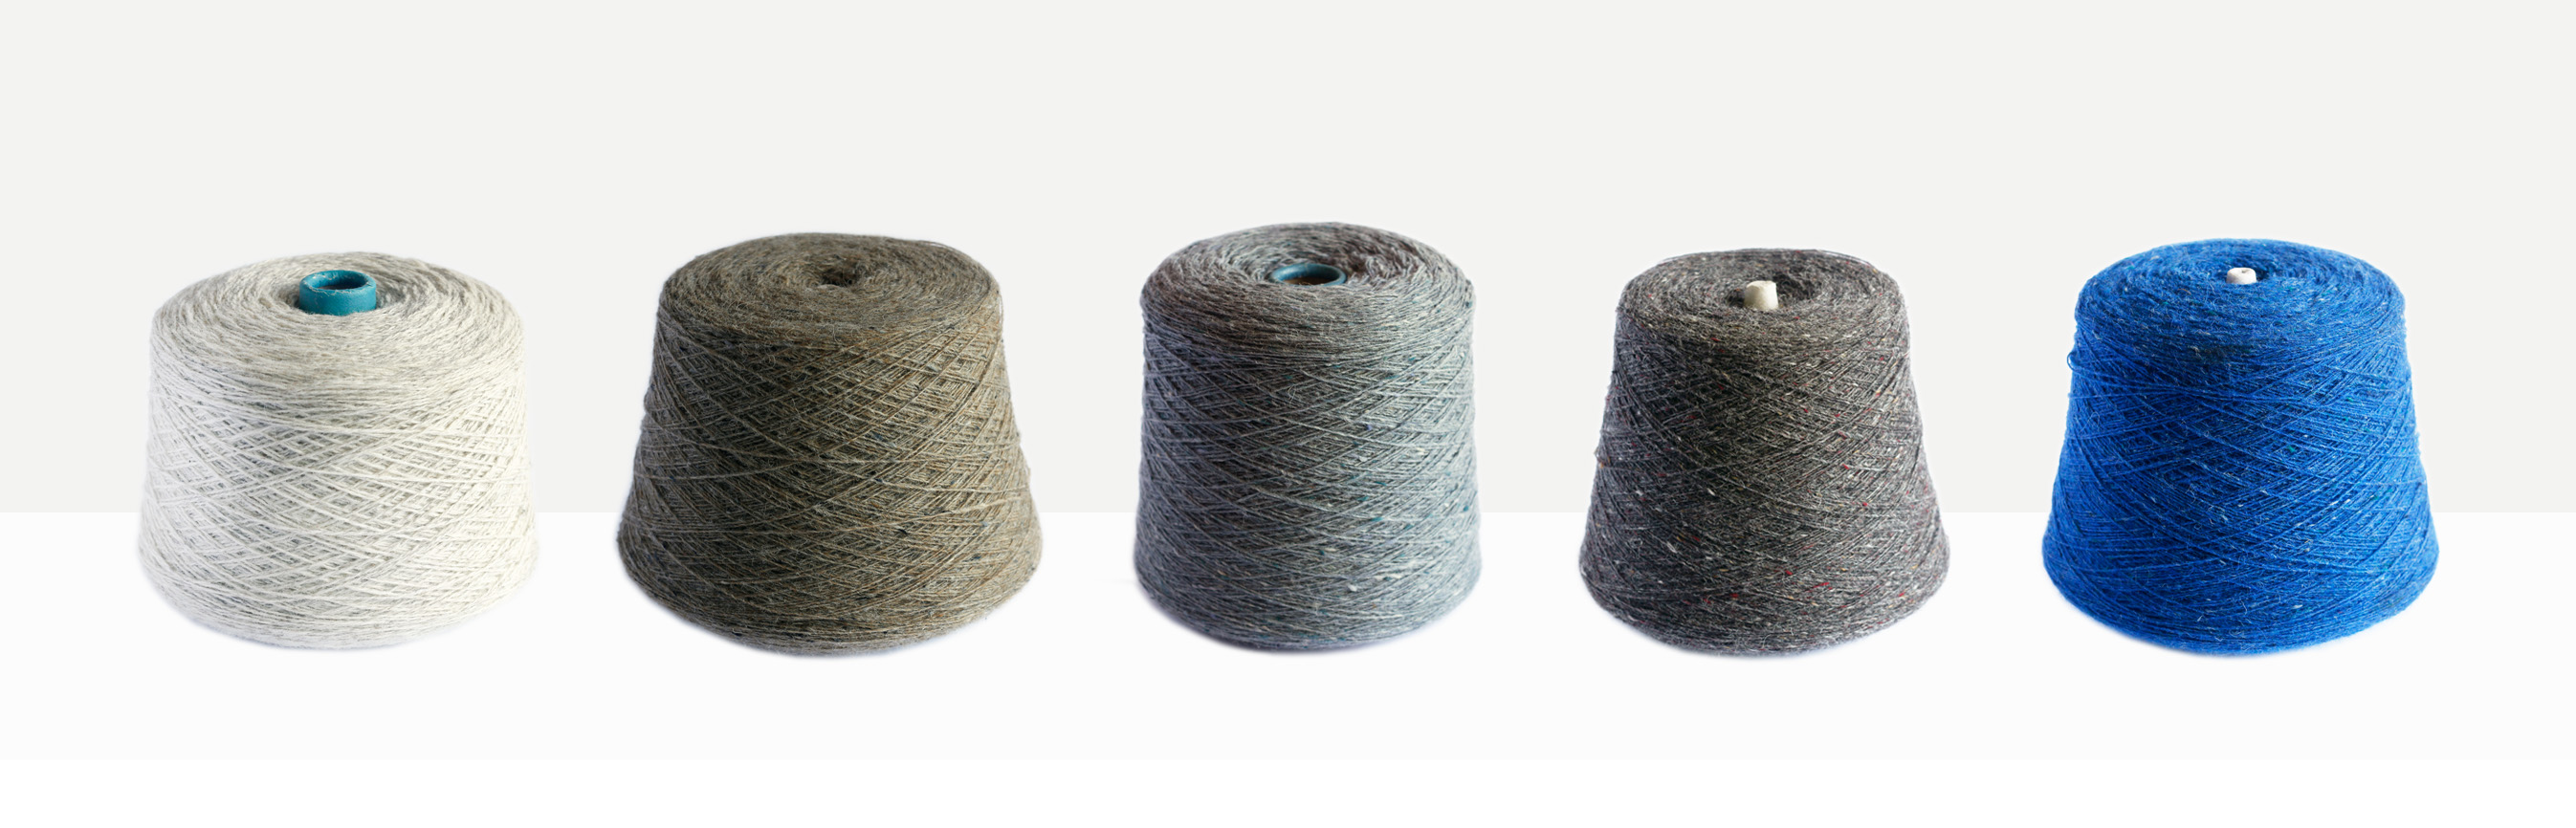 wool spools